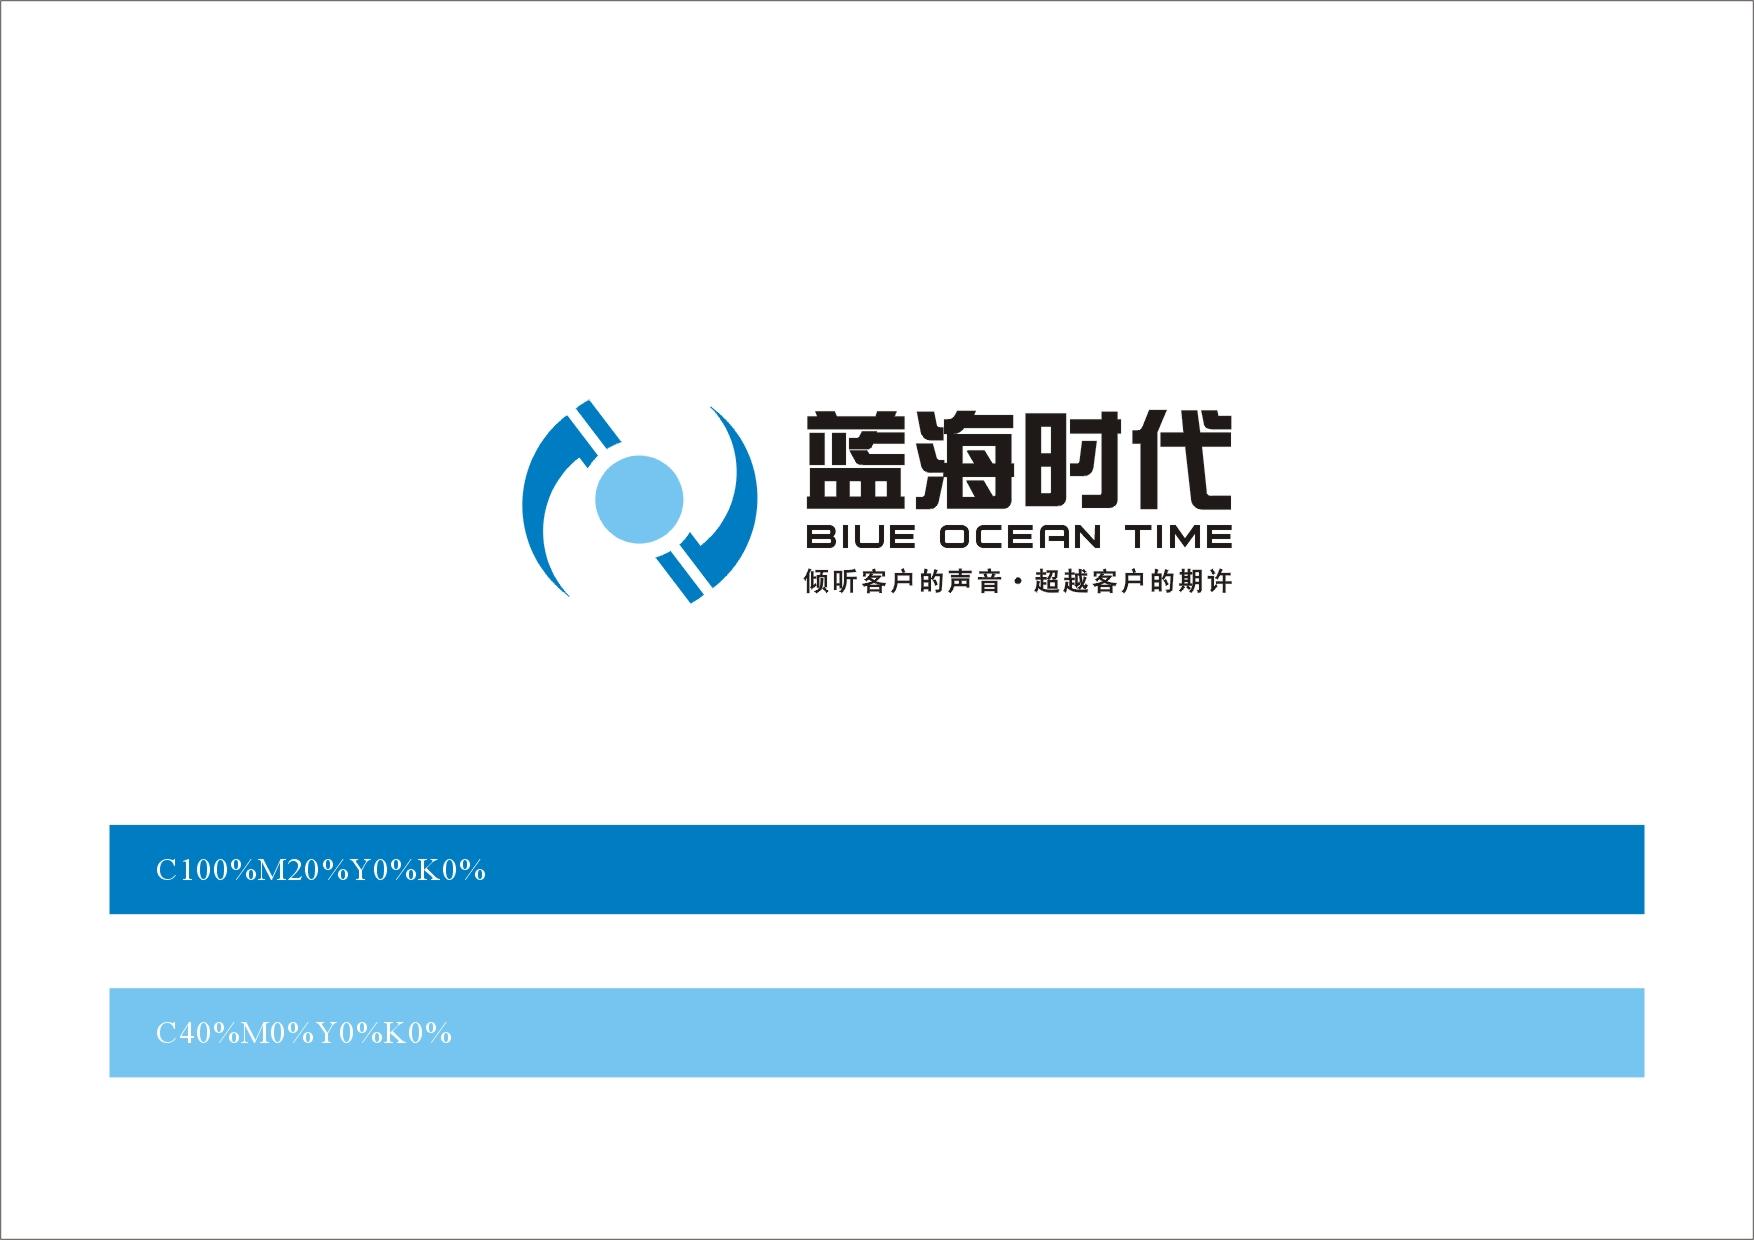 Shenzhen Bule Ocean Time Packaging Products Co., Ltd